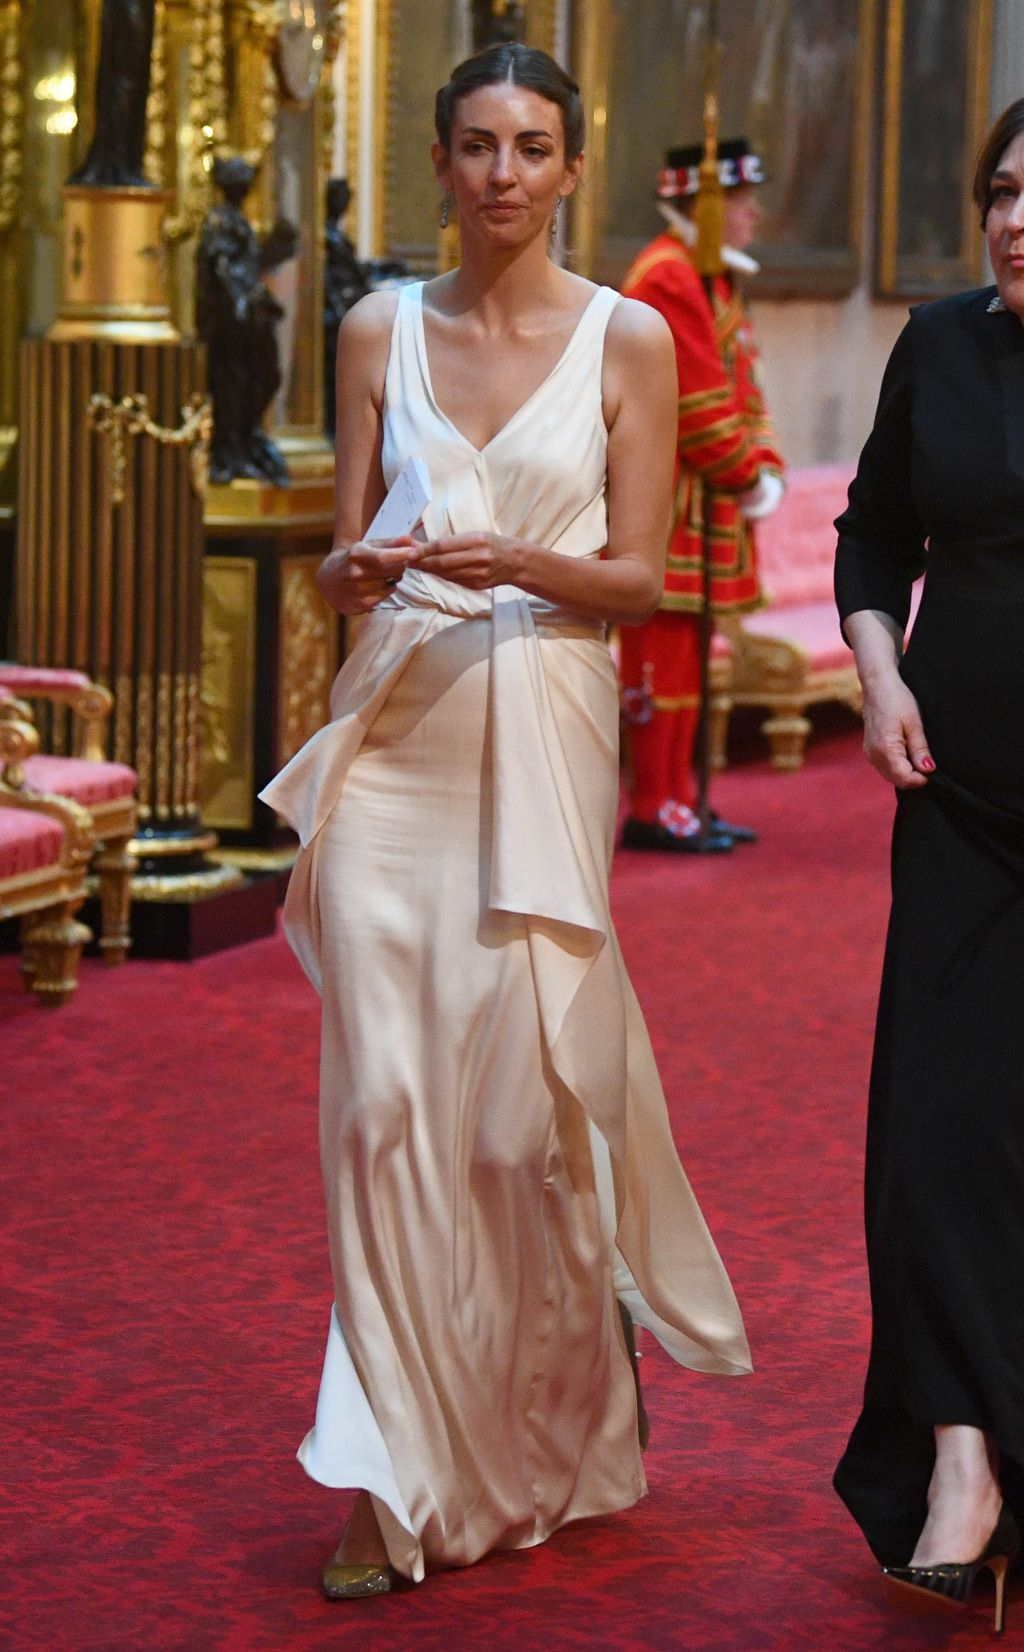 Rose Hanbury Royal Wedding Outfit Royal Wedding Outfits Wedding